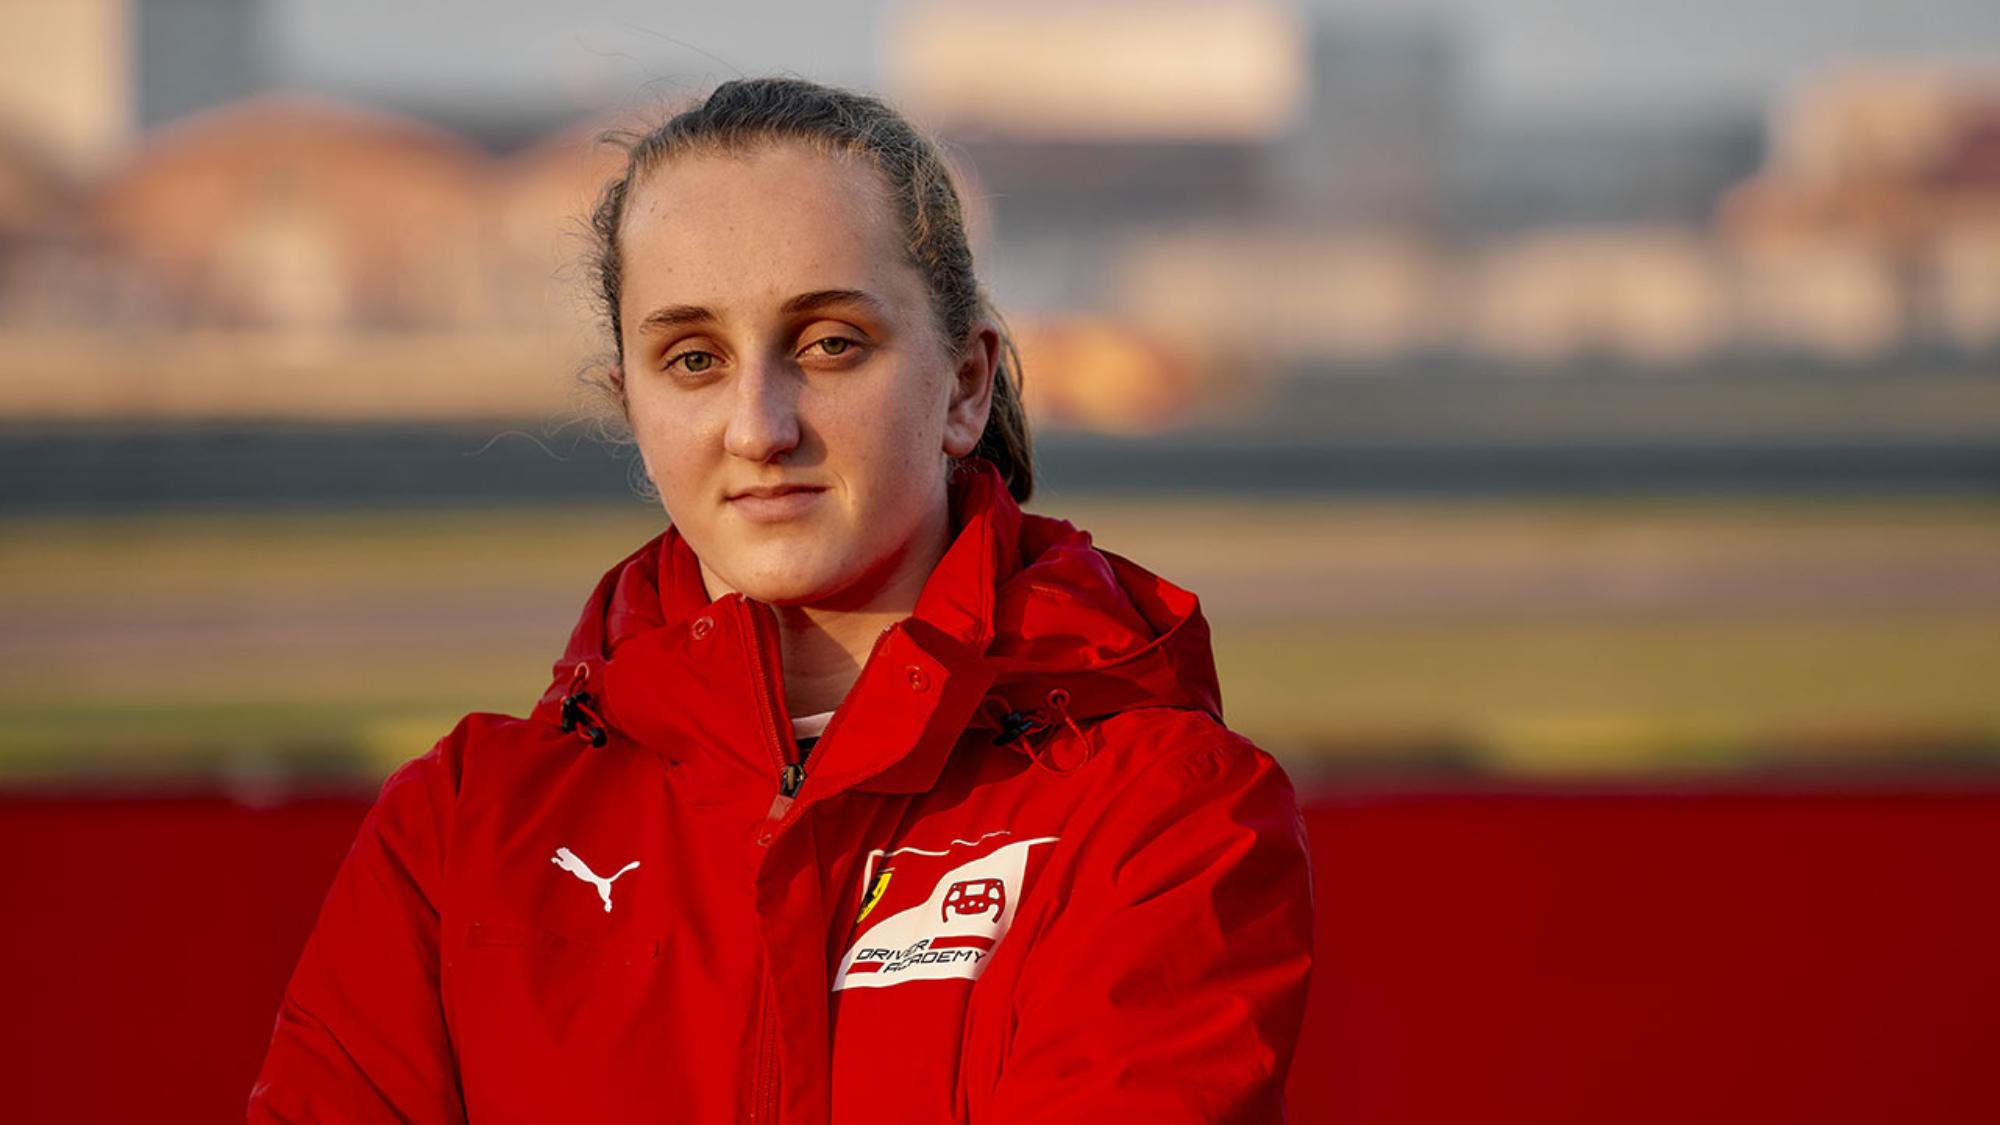 Why Maya Weug has a shot at F1 as Ferrari's first female Academy driver